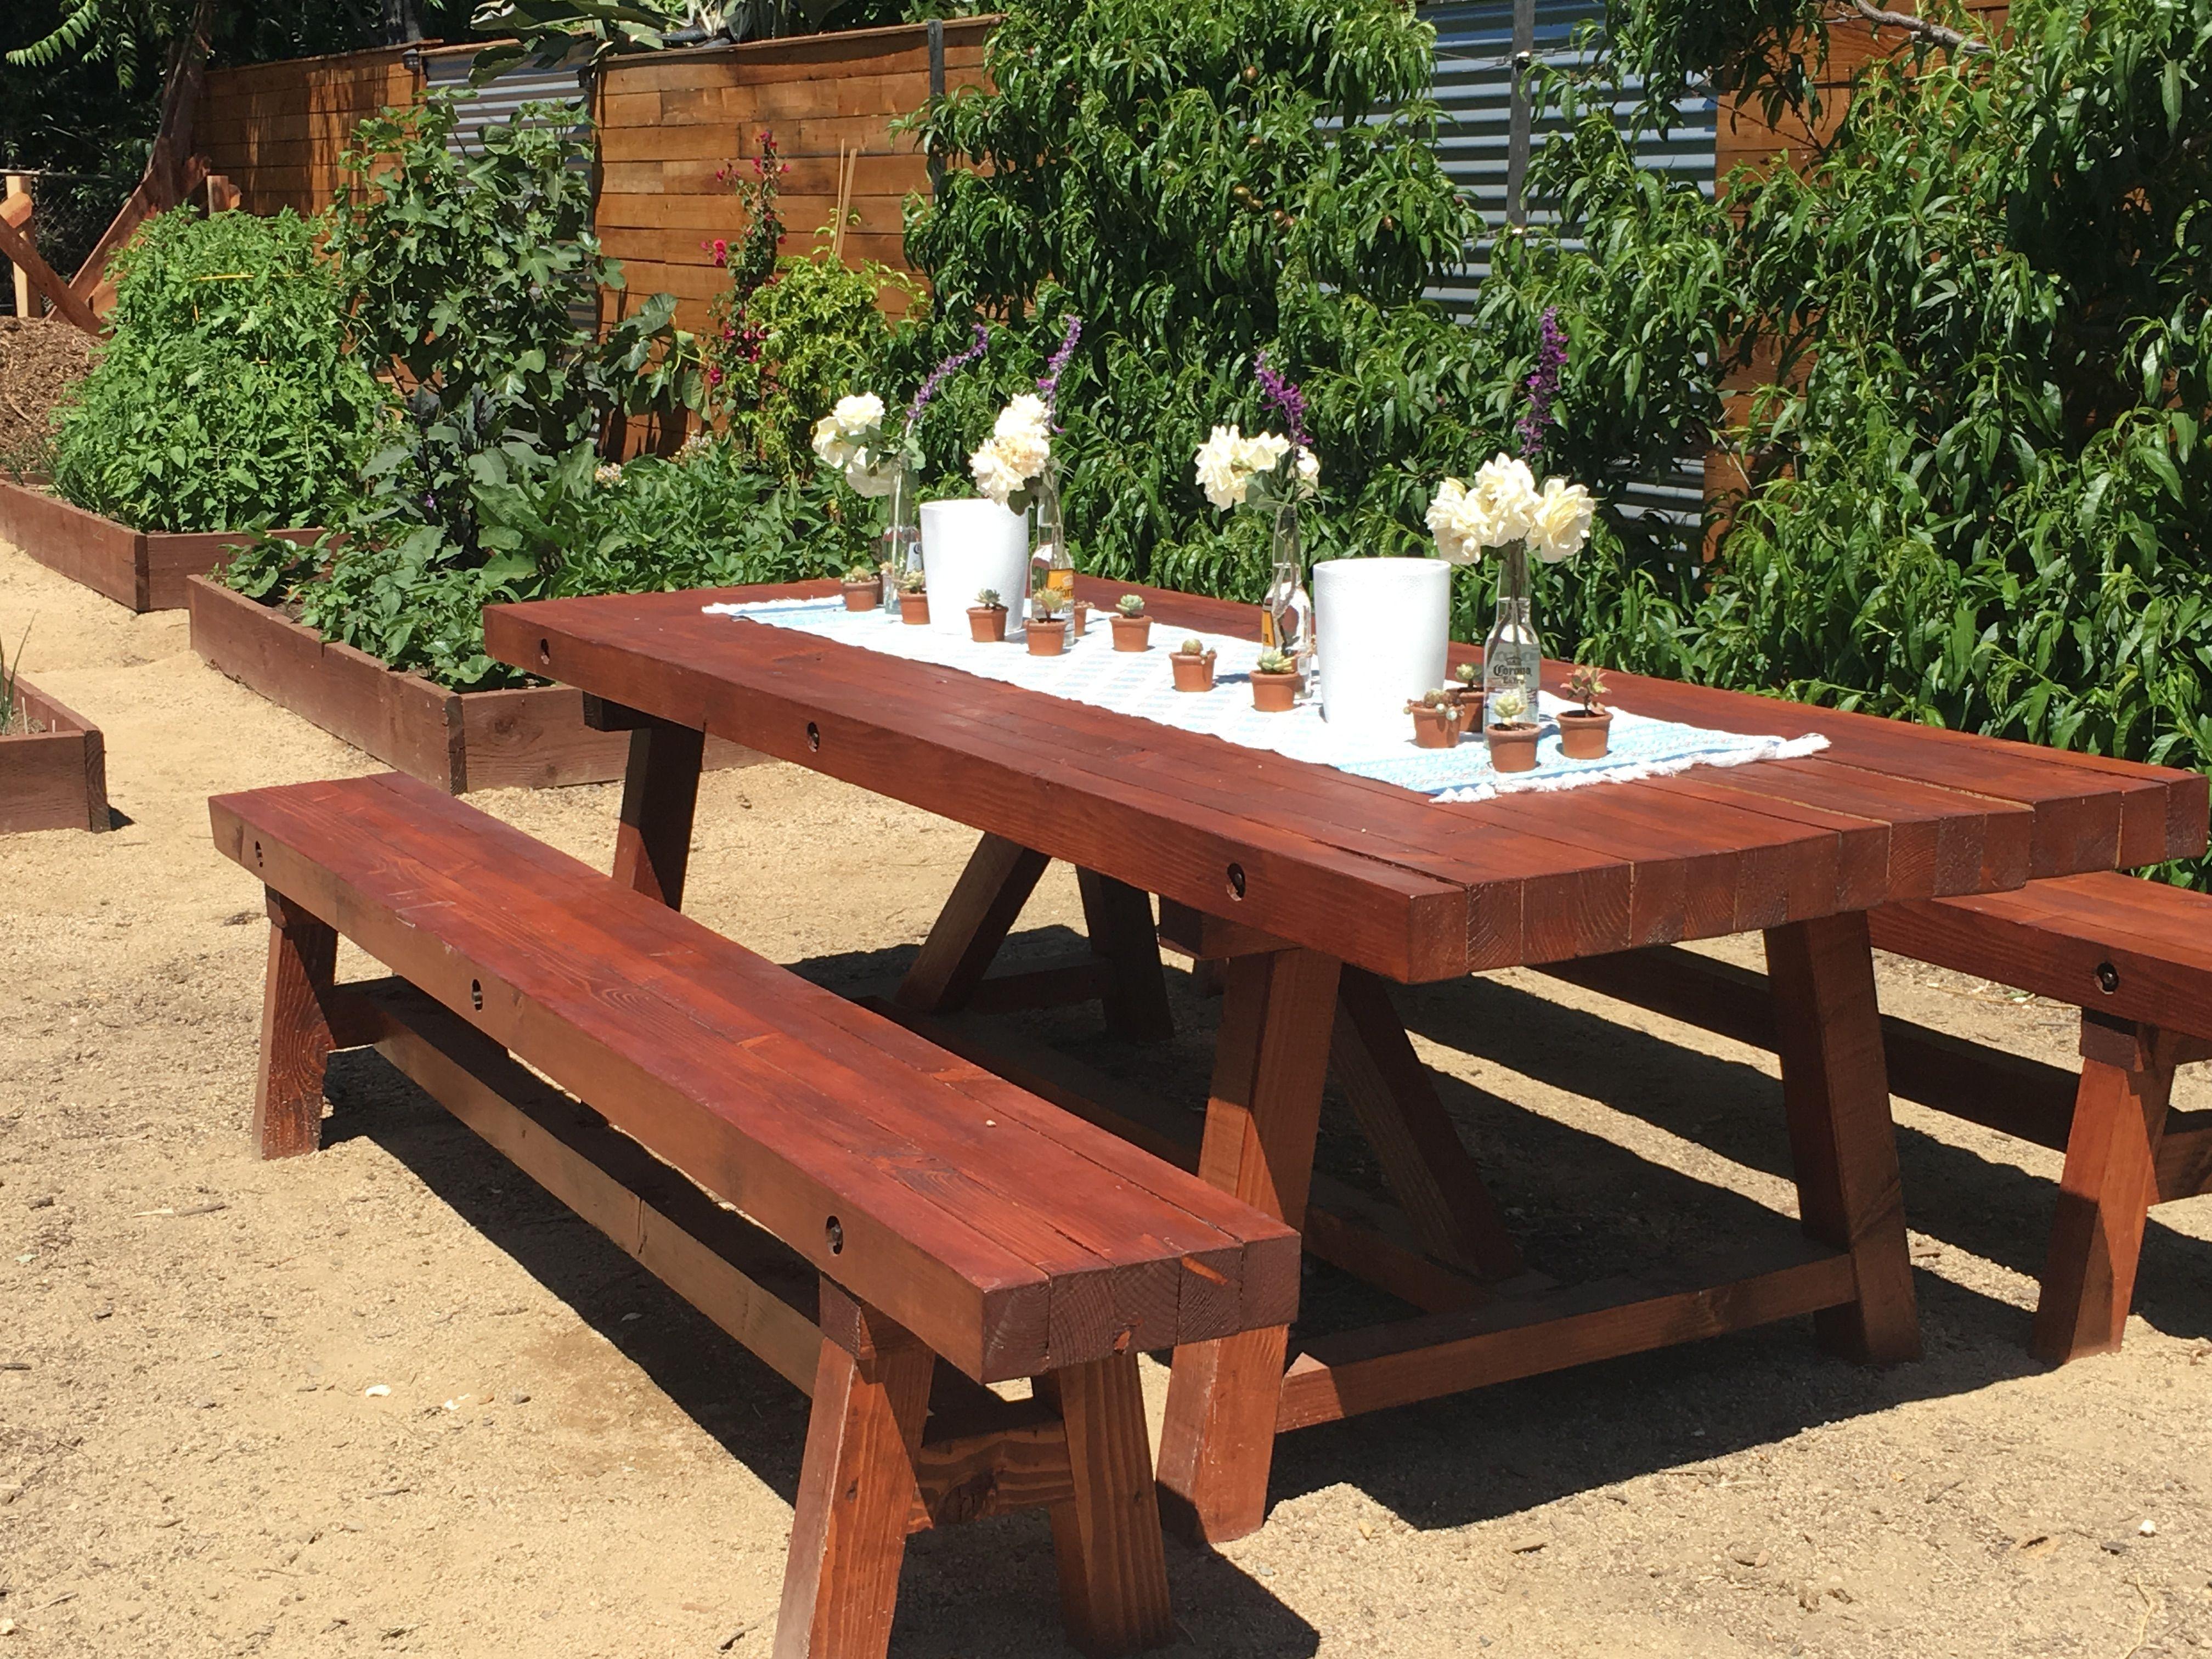 Diy farmhouse patio table and garden rustic dining table